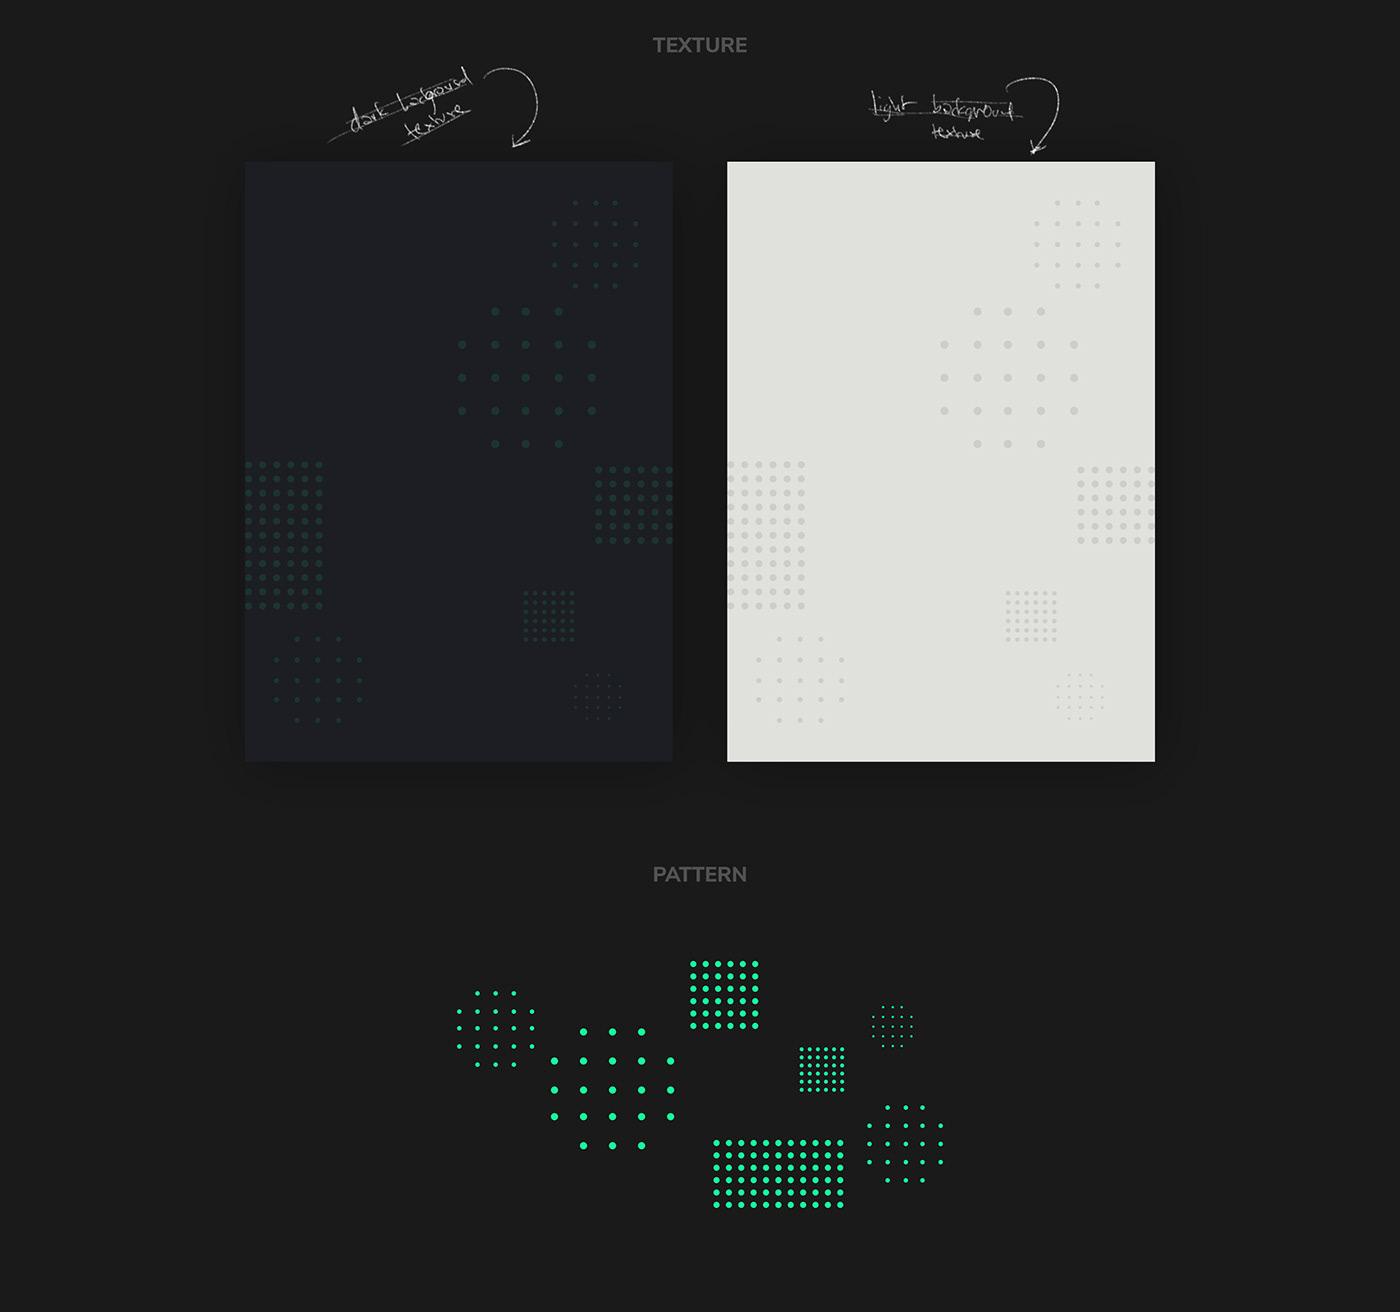 artwork branding  business illustration charging Corporate Design ILLUSTRATION  phone sketchstyle stationary Tech Illustration